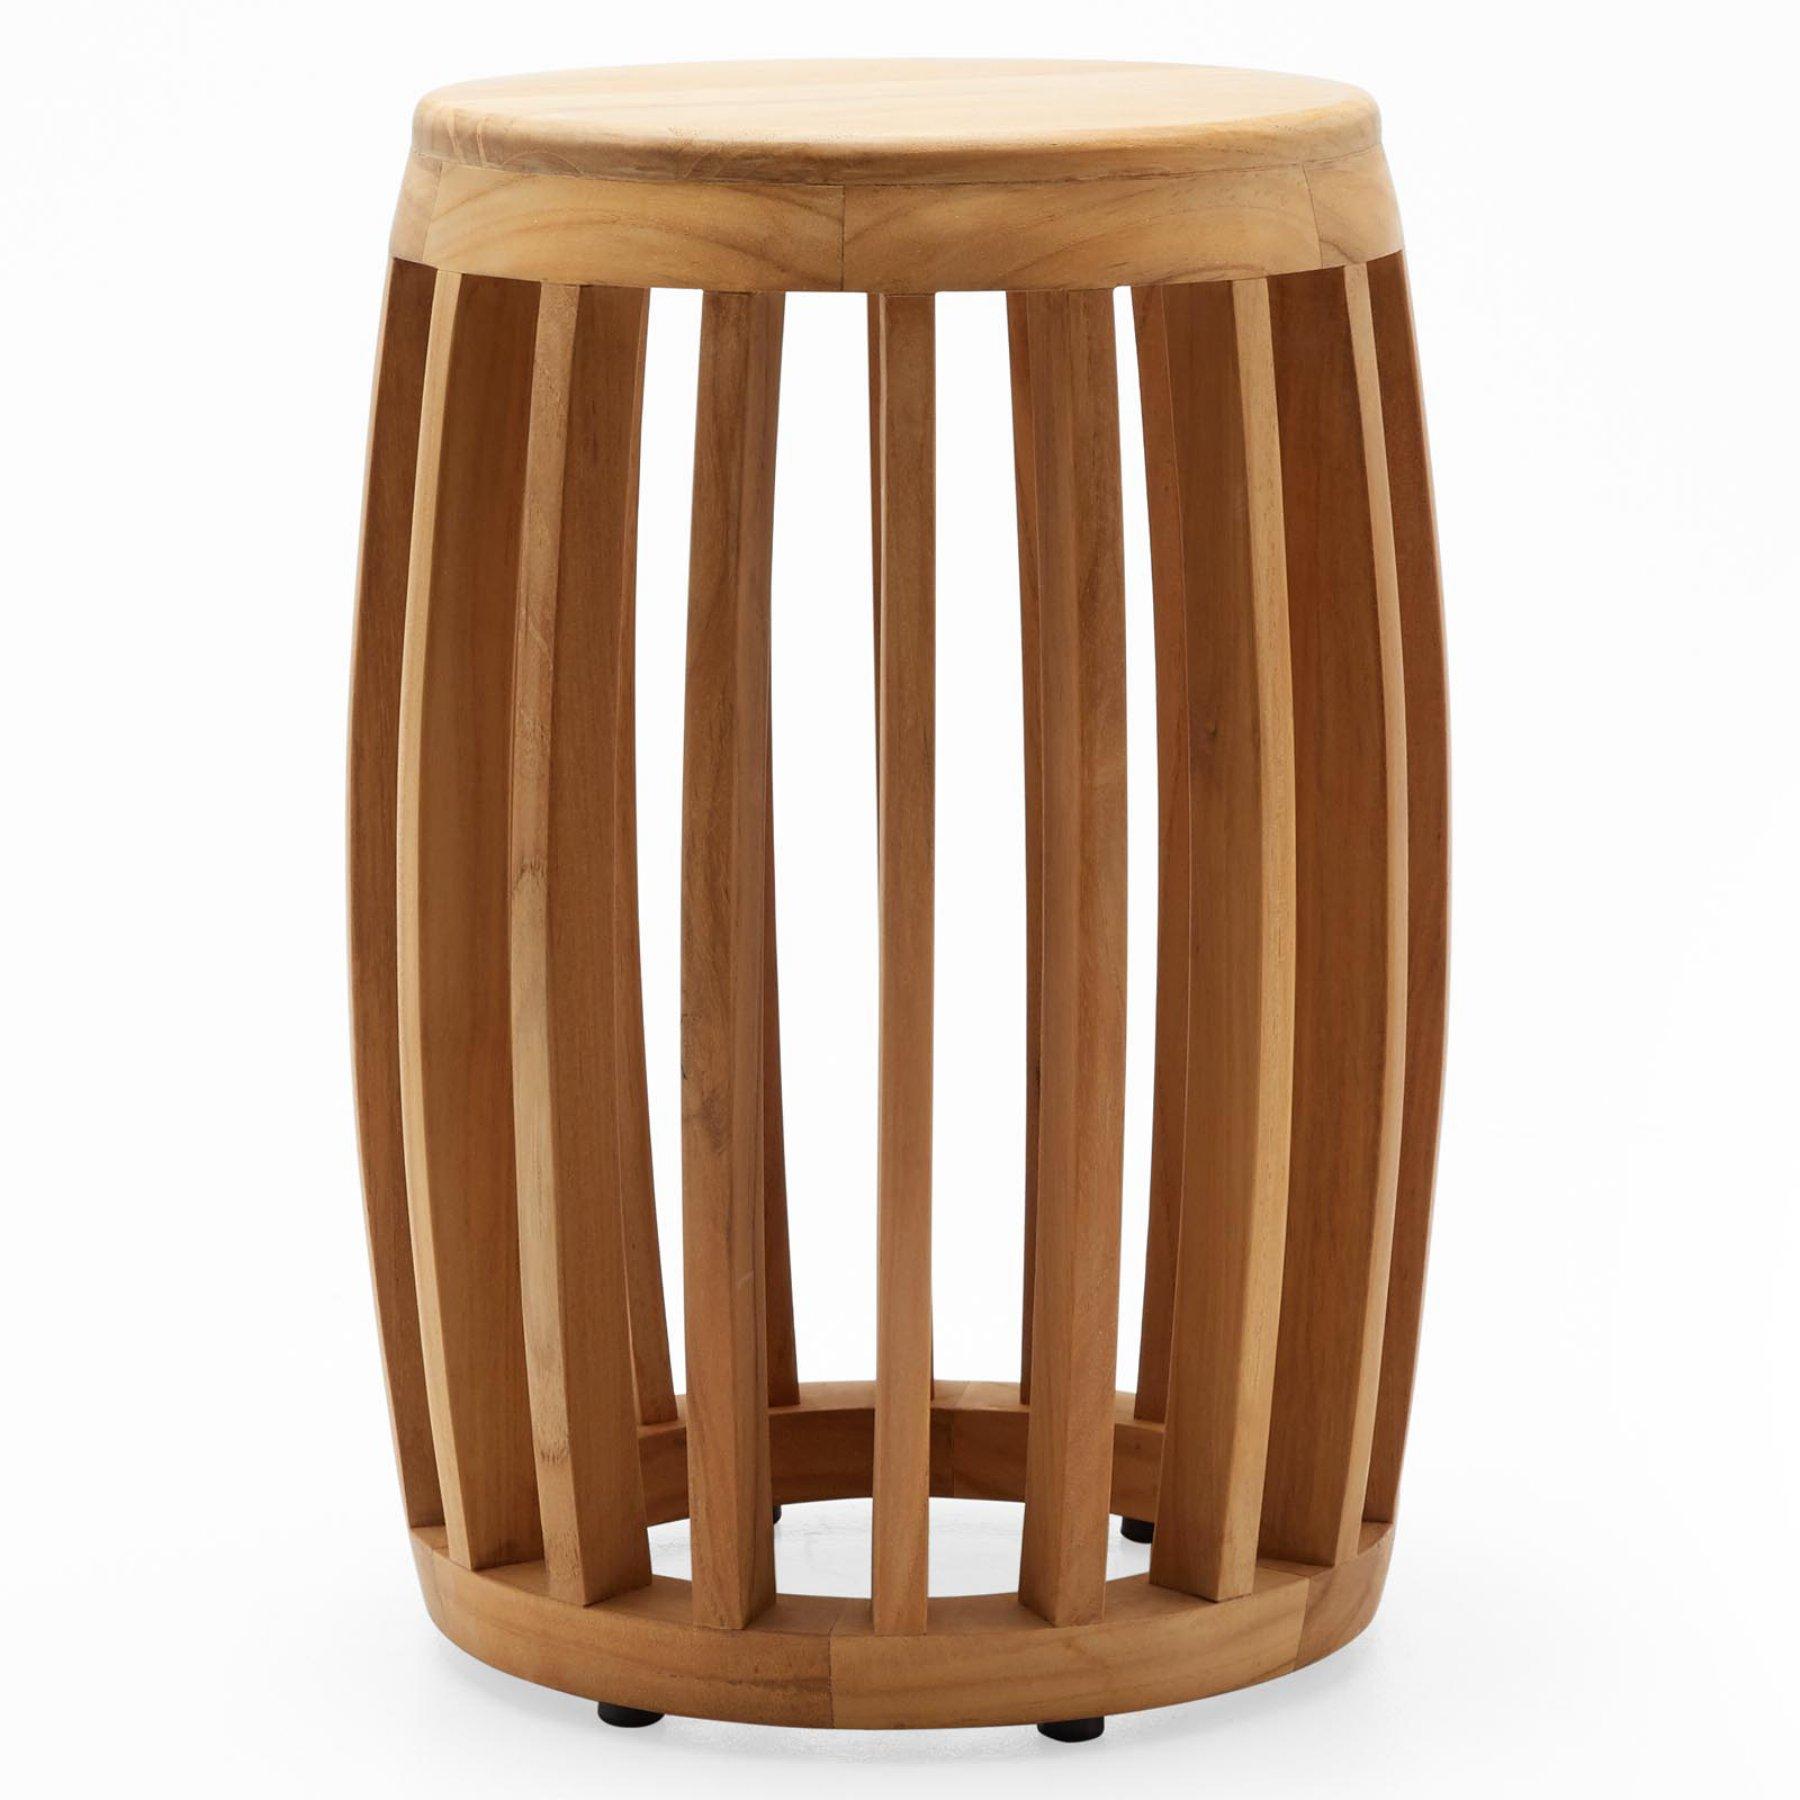 Brilliant Outdoor Modrn Teak Wood Slat Garden Stool In 2019 Wood Unemploymentrelief Wooden Chair Designs For Living Room Unemploymentrelieforg